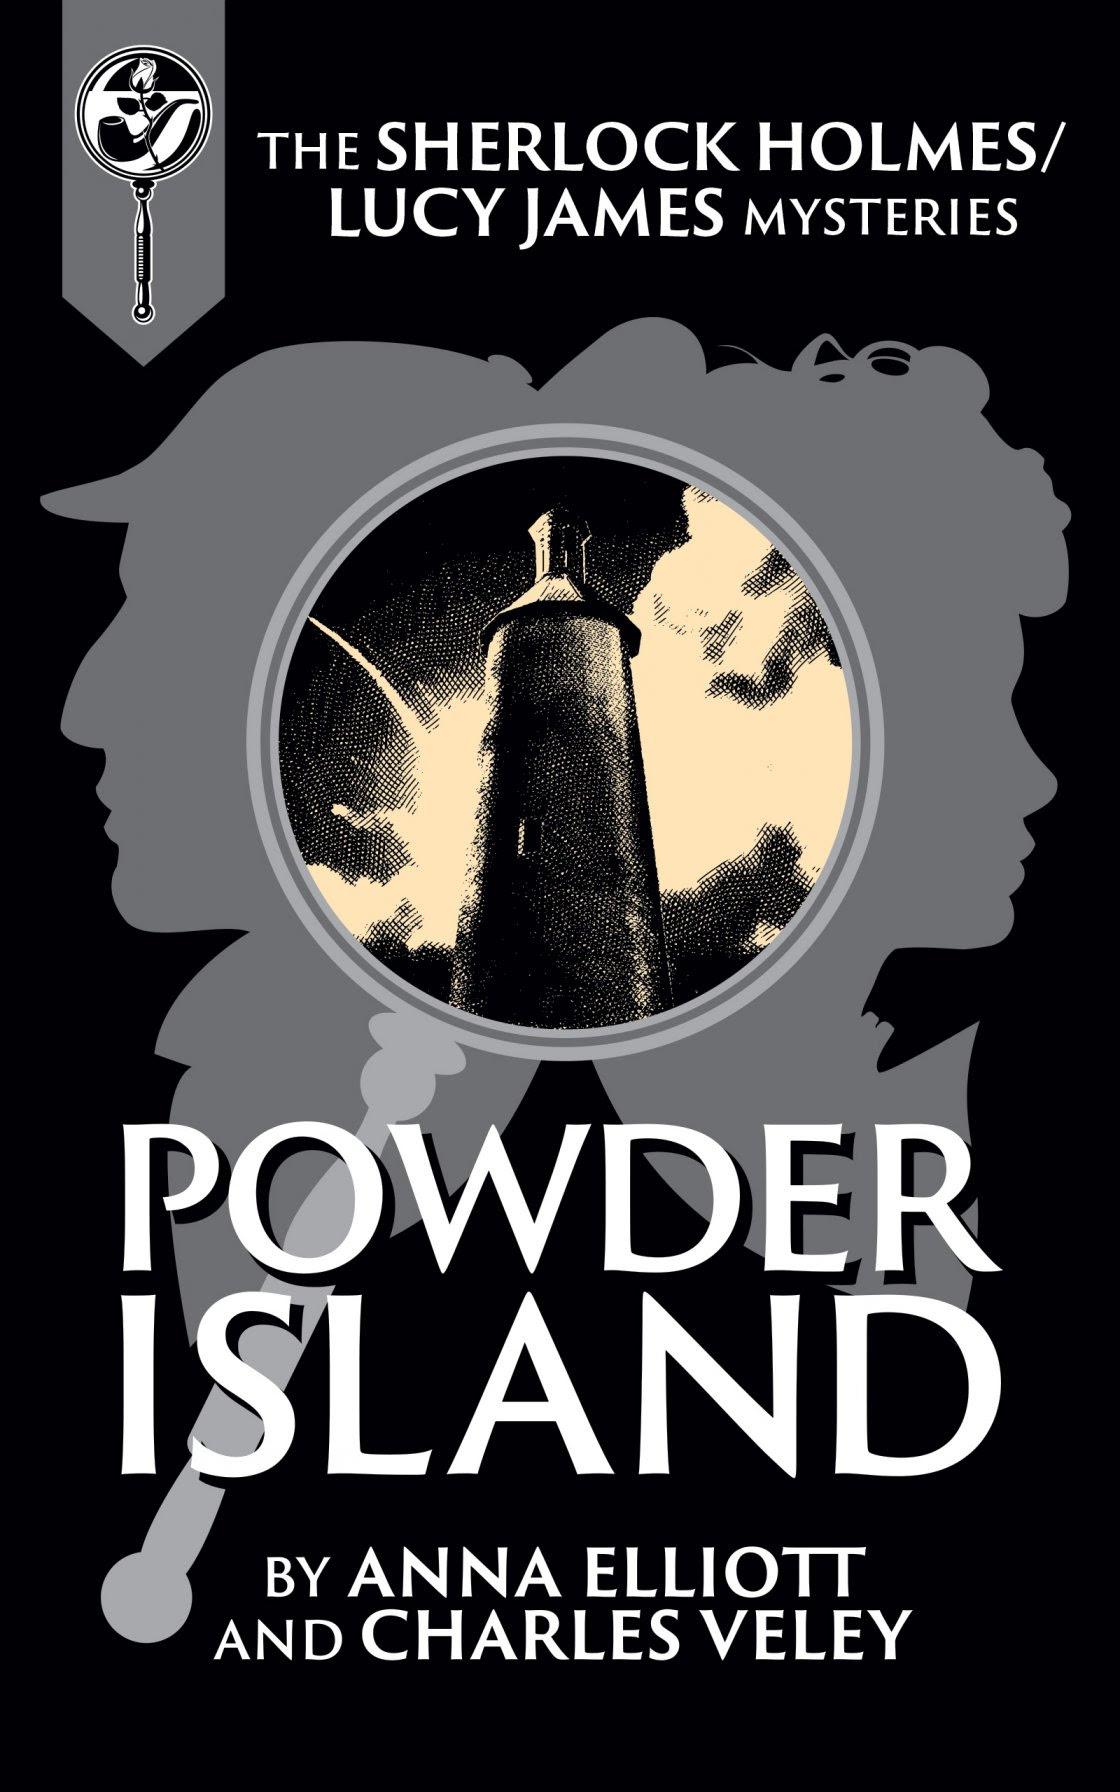 Powder Island: A Sherlock Holmes and Lucy James Mystery